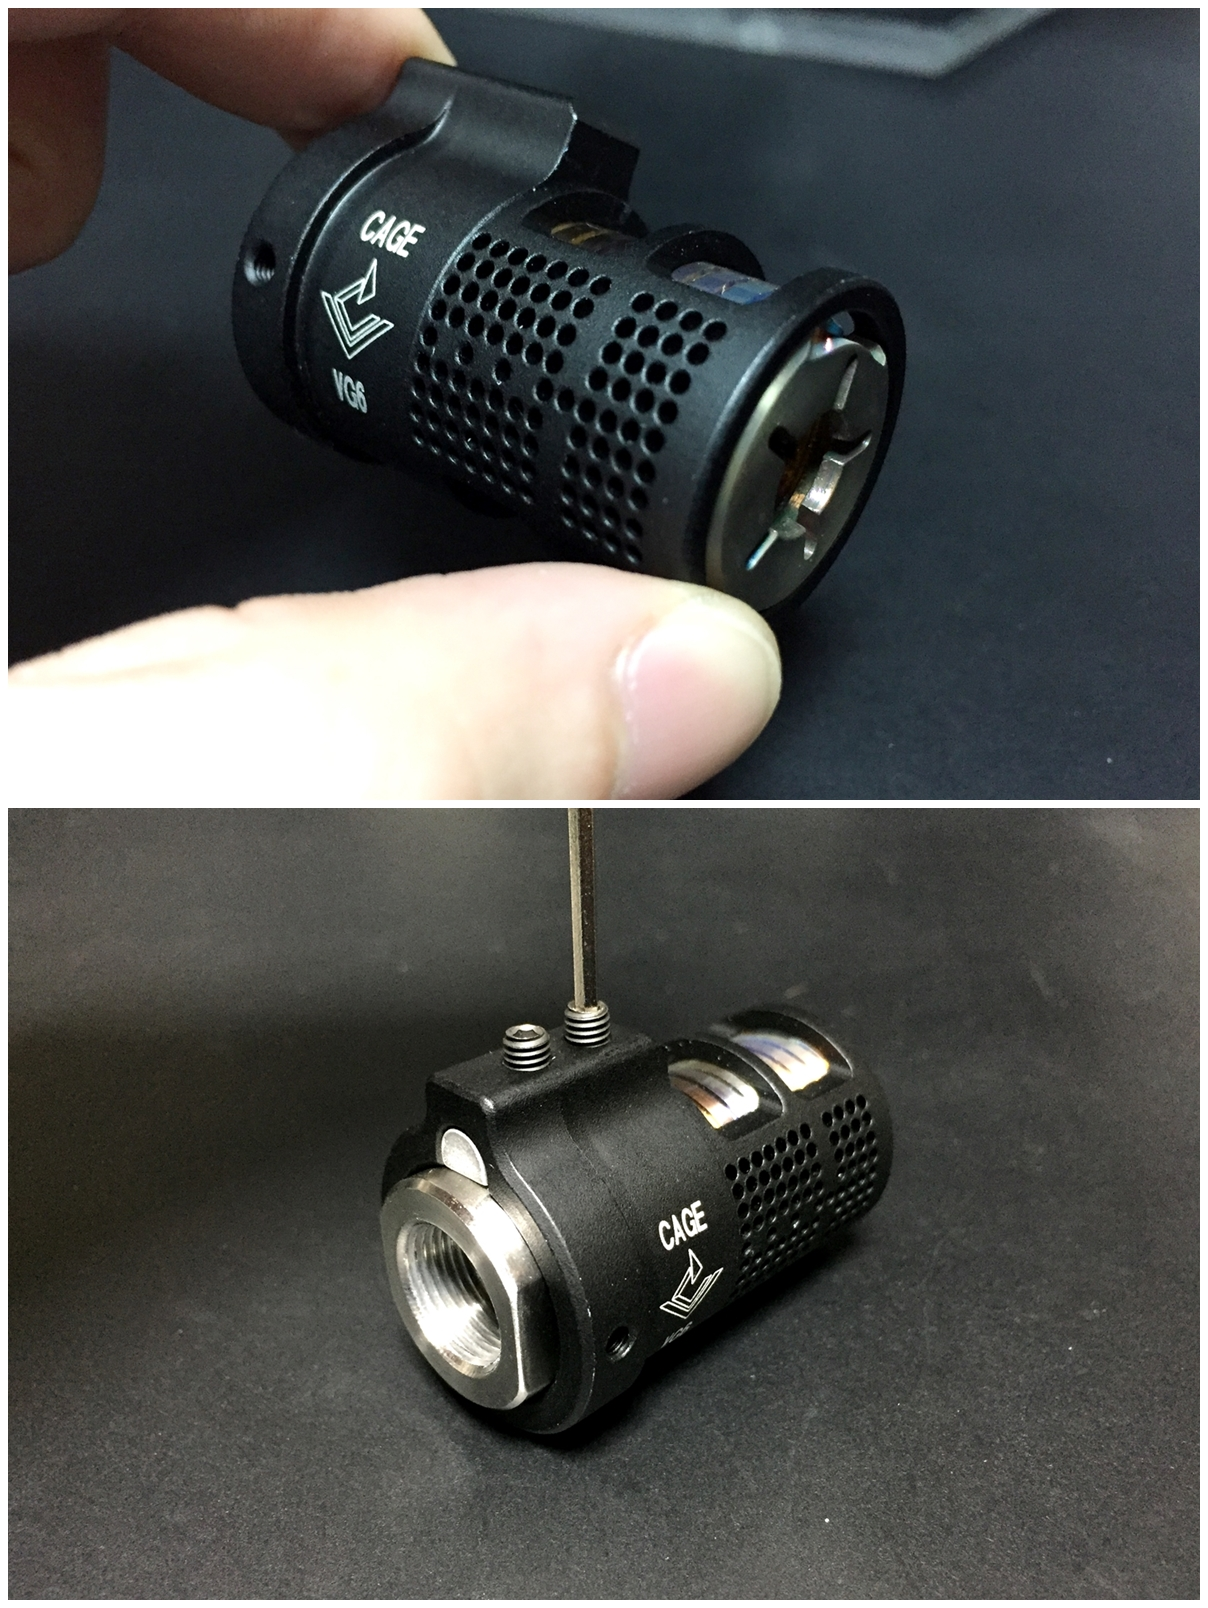 7 VG6 Precision CAGE Device TYPE フラッシュ ハイダー ブラストシールド オプション カバー 購入 開封 比較 実物 レプリカ レビュー